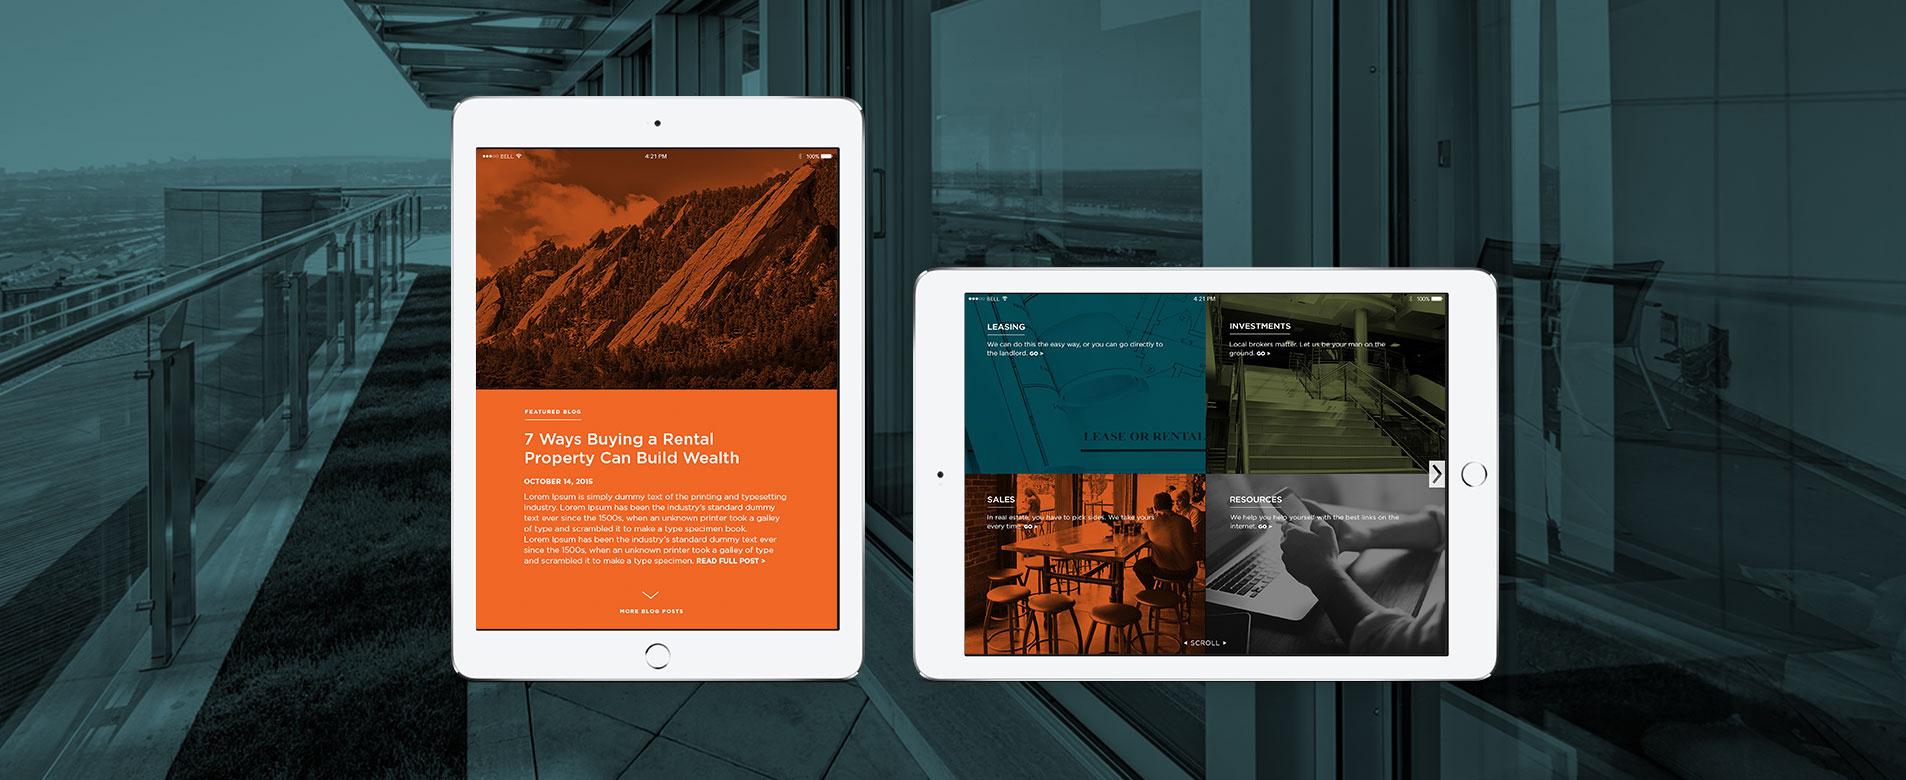 mobile website designs for boom properties